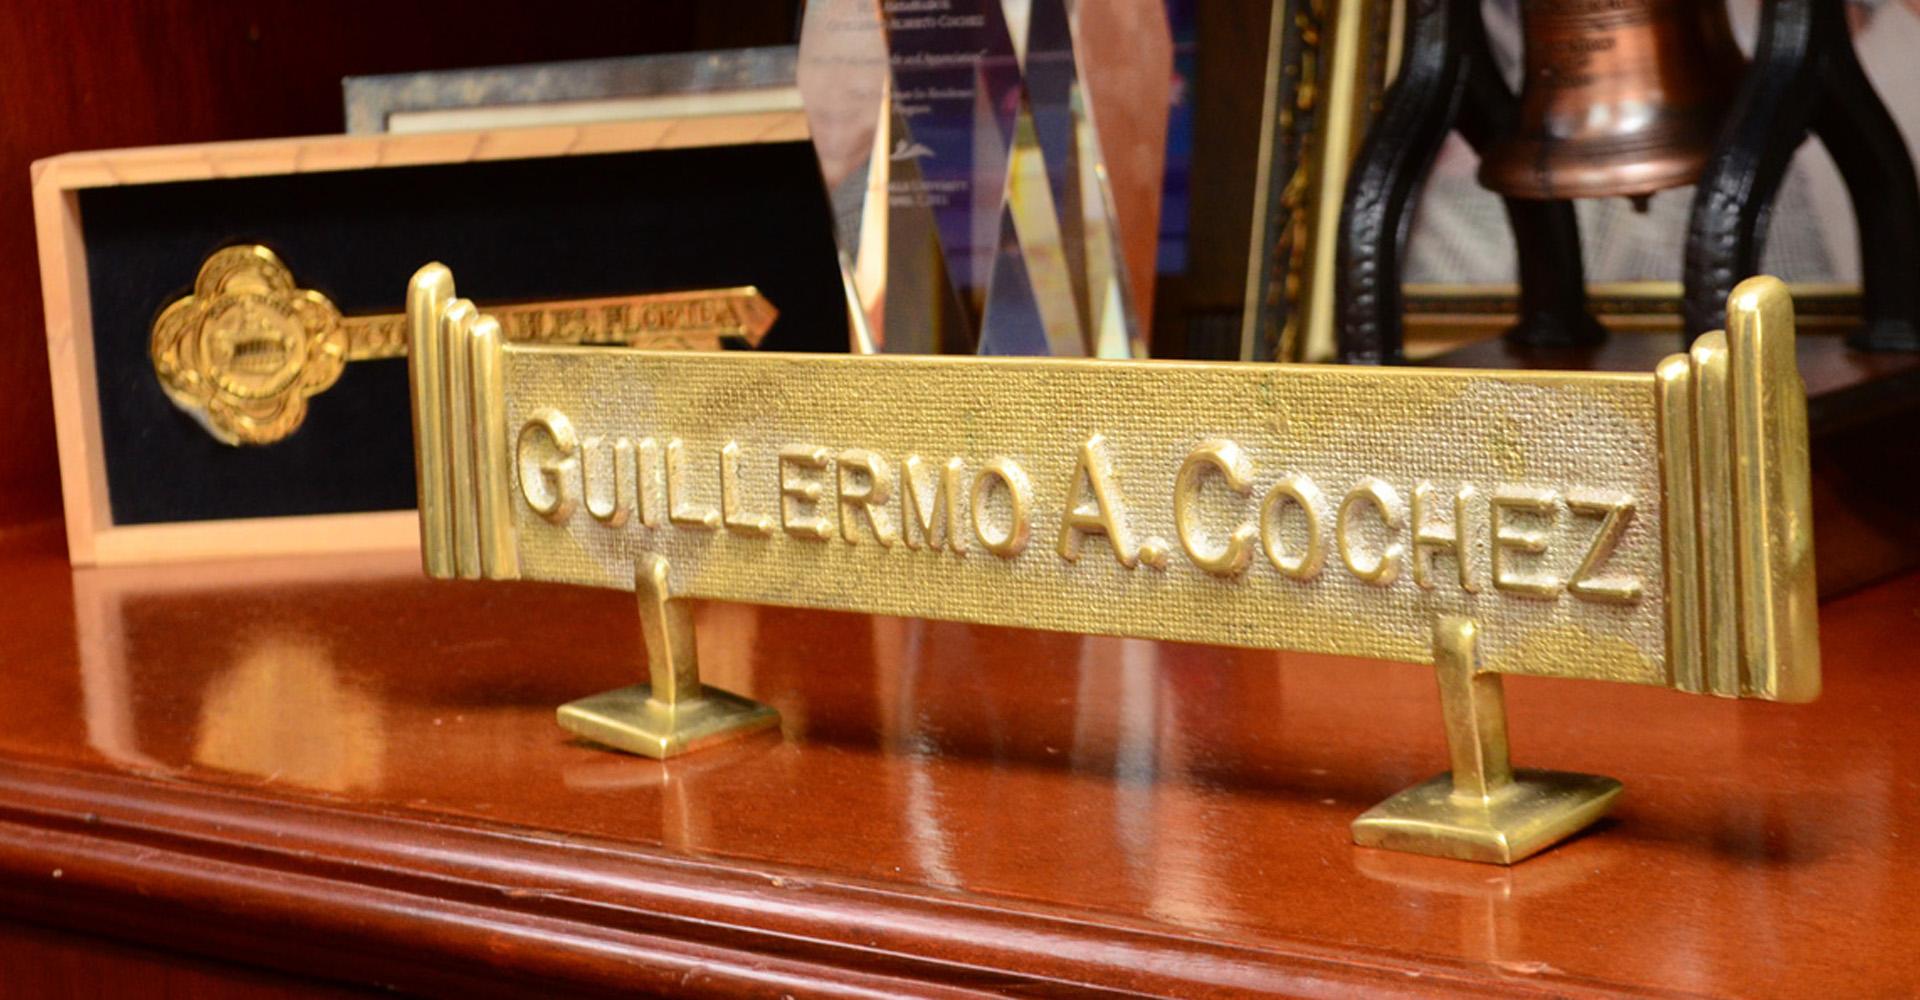 guillermocochez_6383-1920x1000